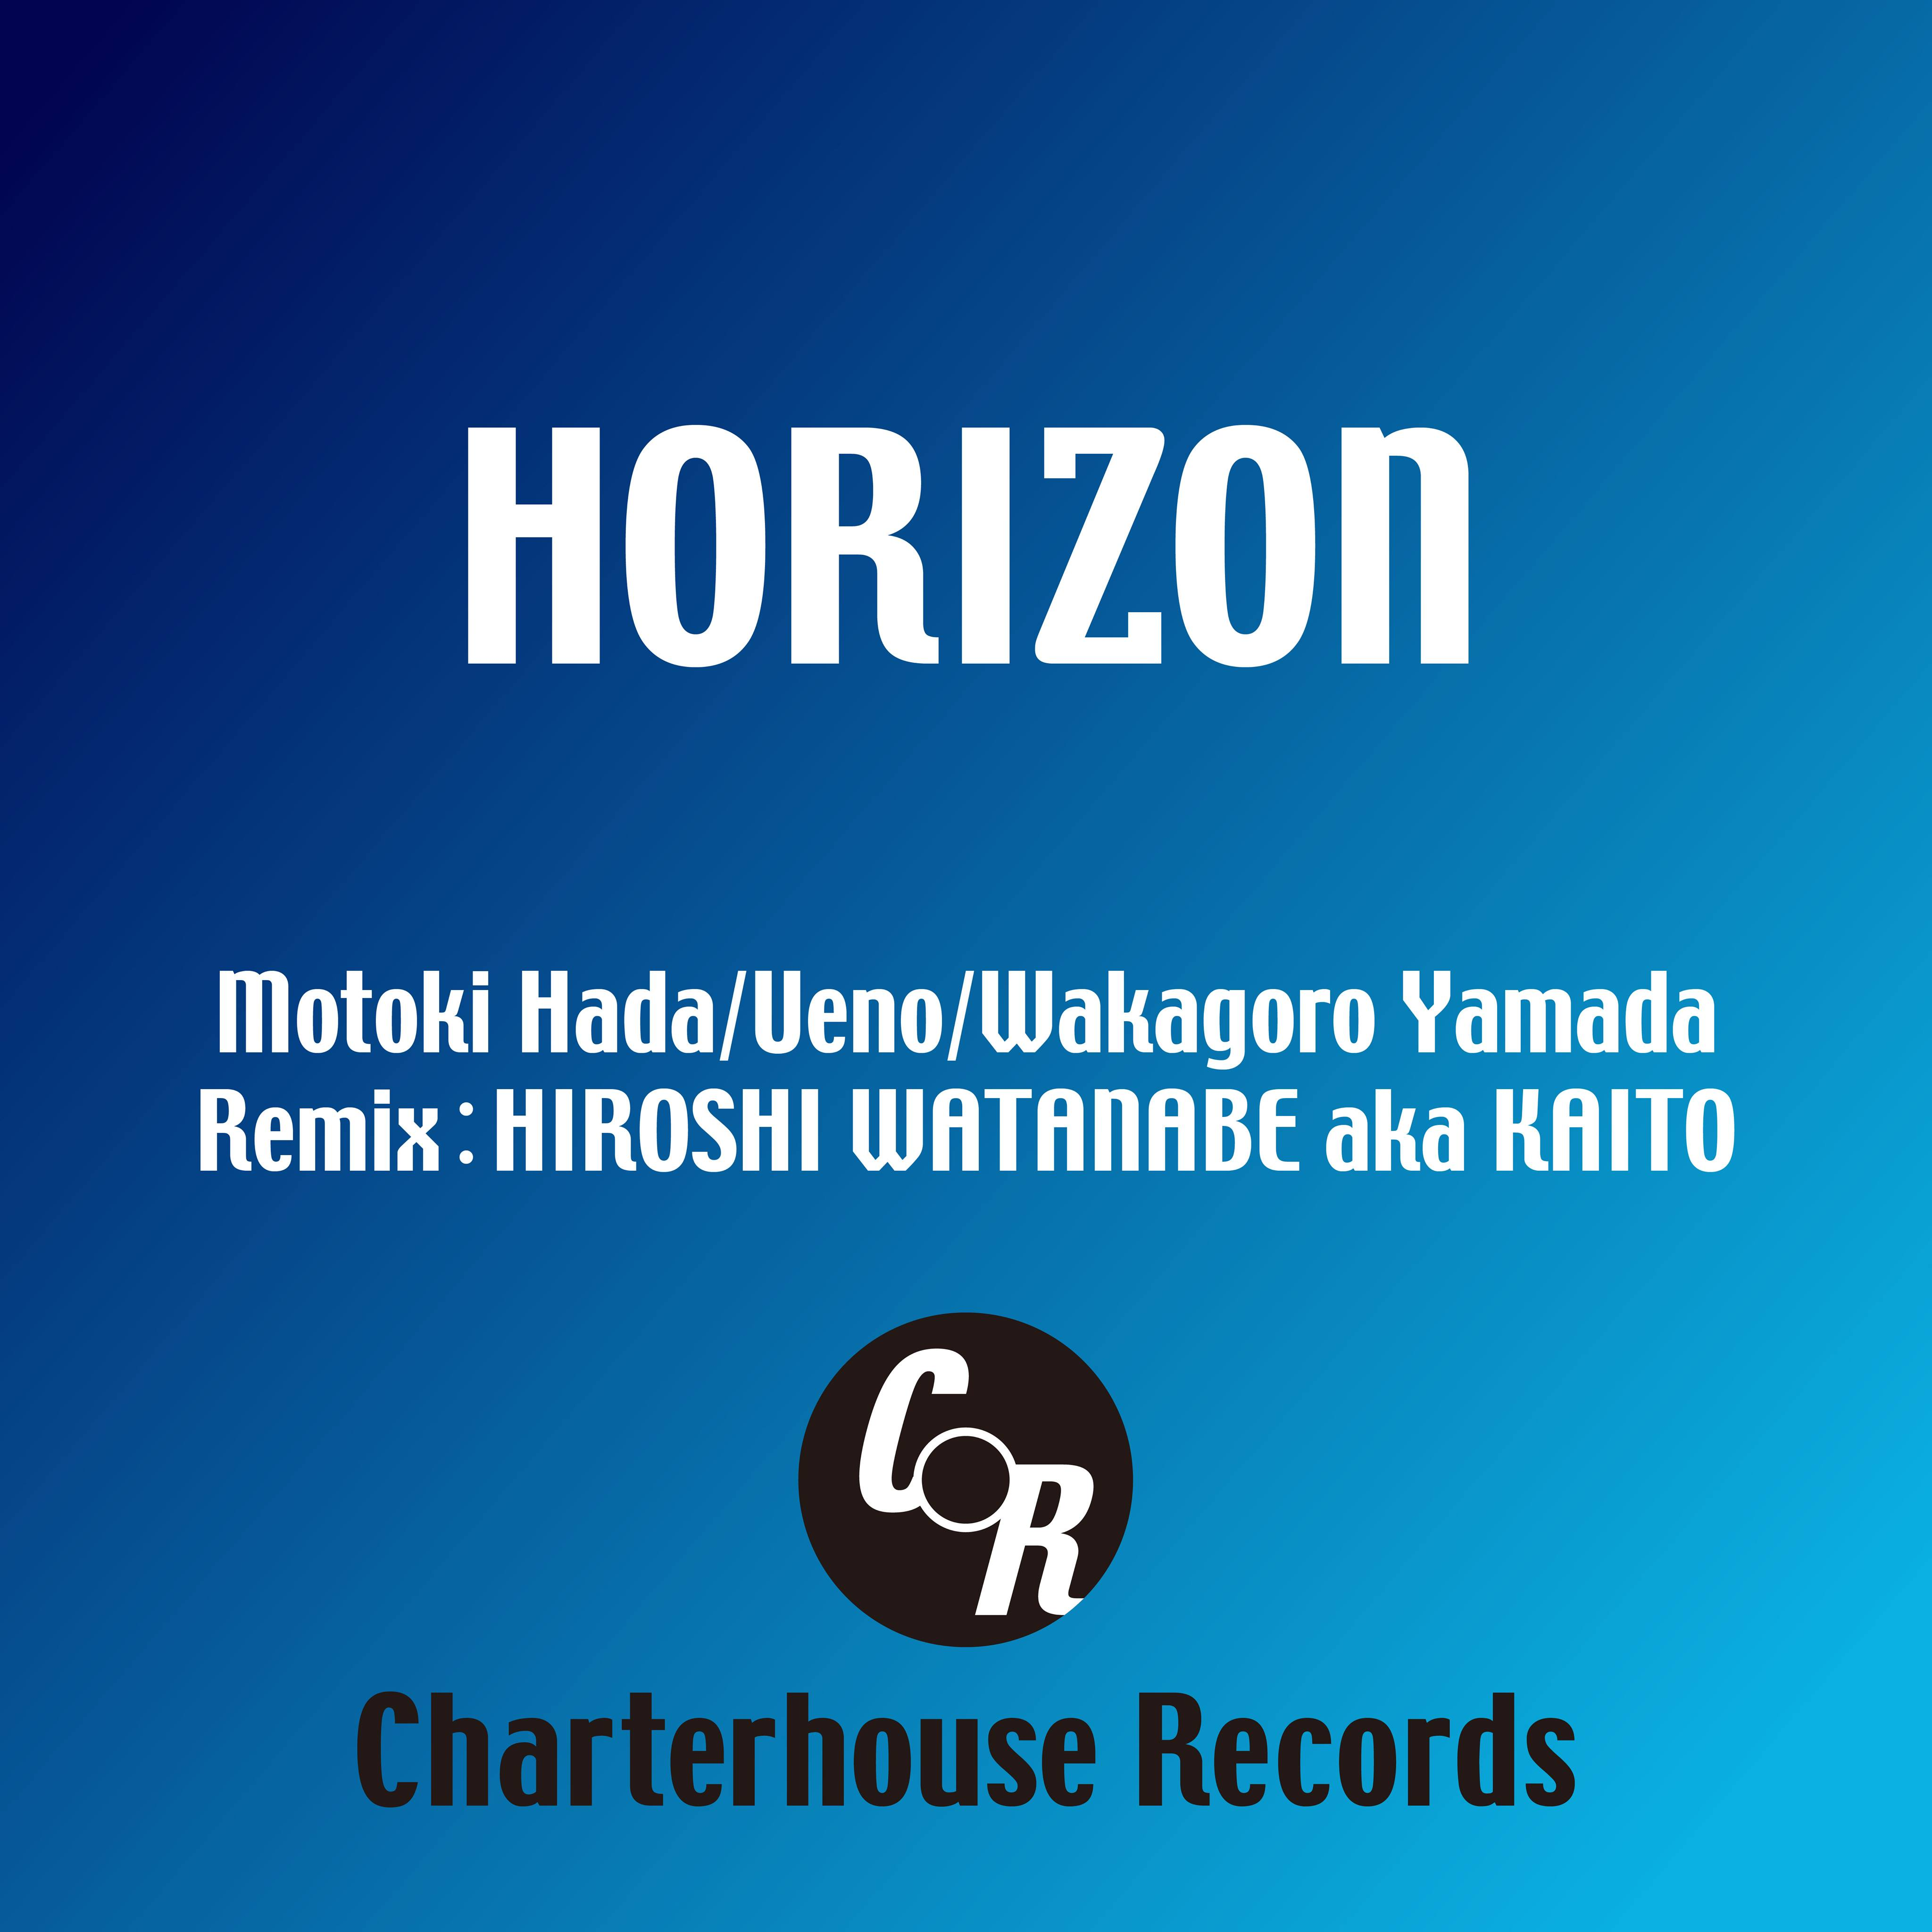 005_Charterhouse (Motoki Hada/Ueno/Wakagoro Yamada) Horizon EP